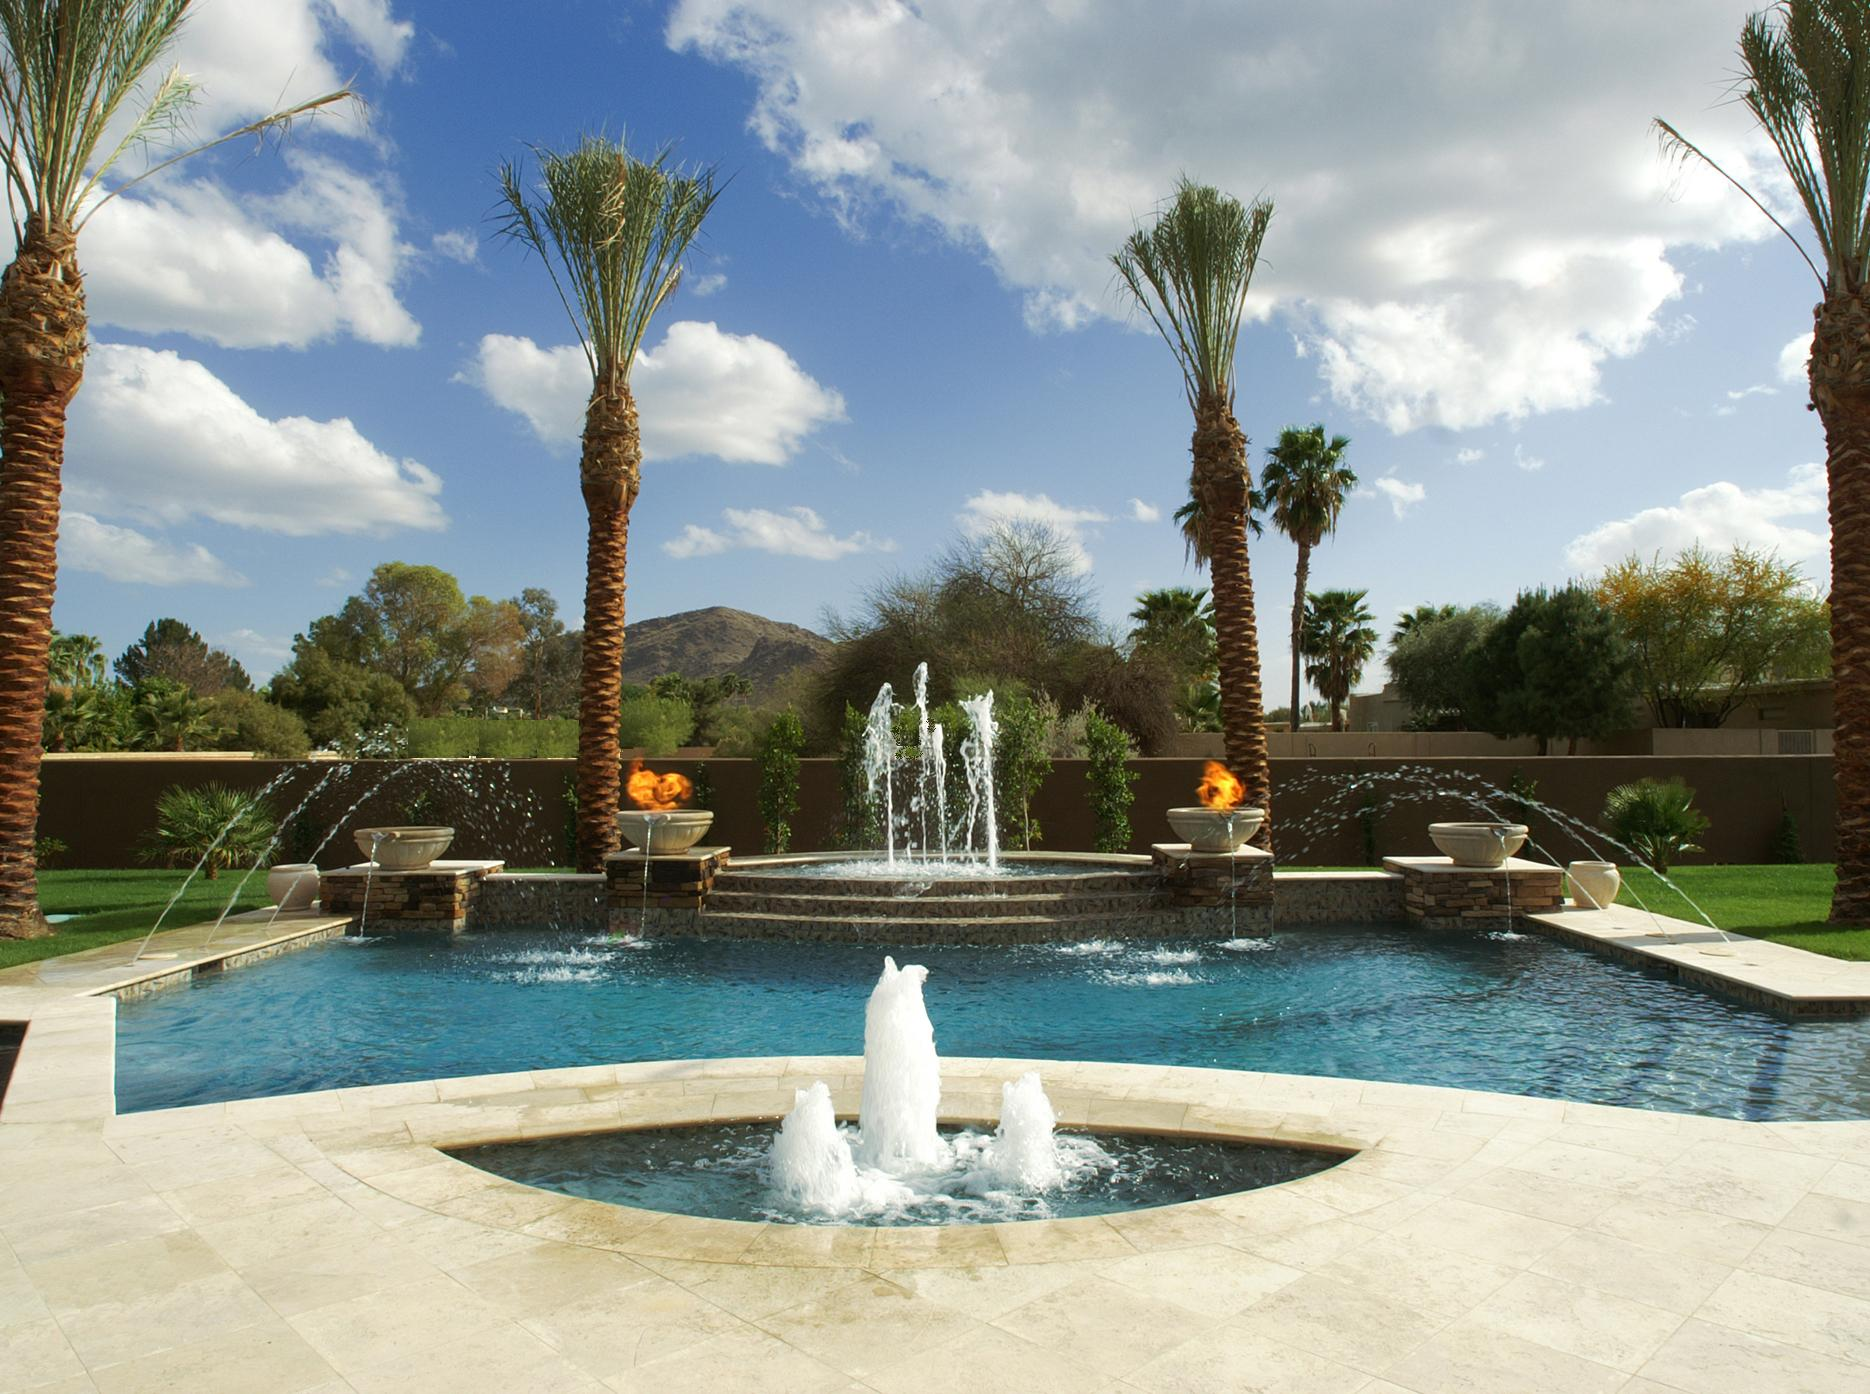 Pool Spas - Allstate Pool & Spas